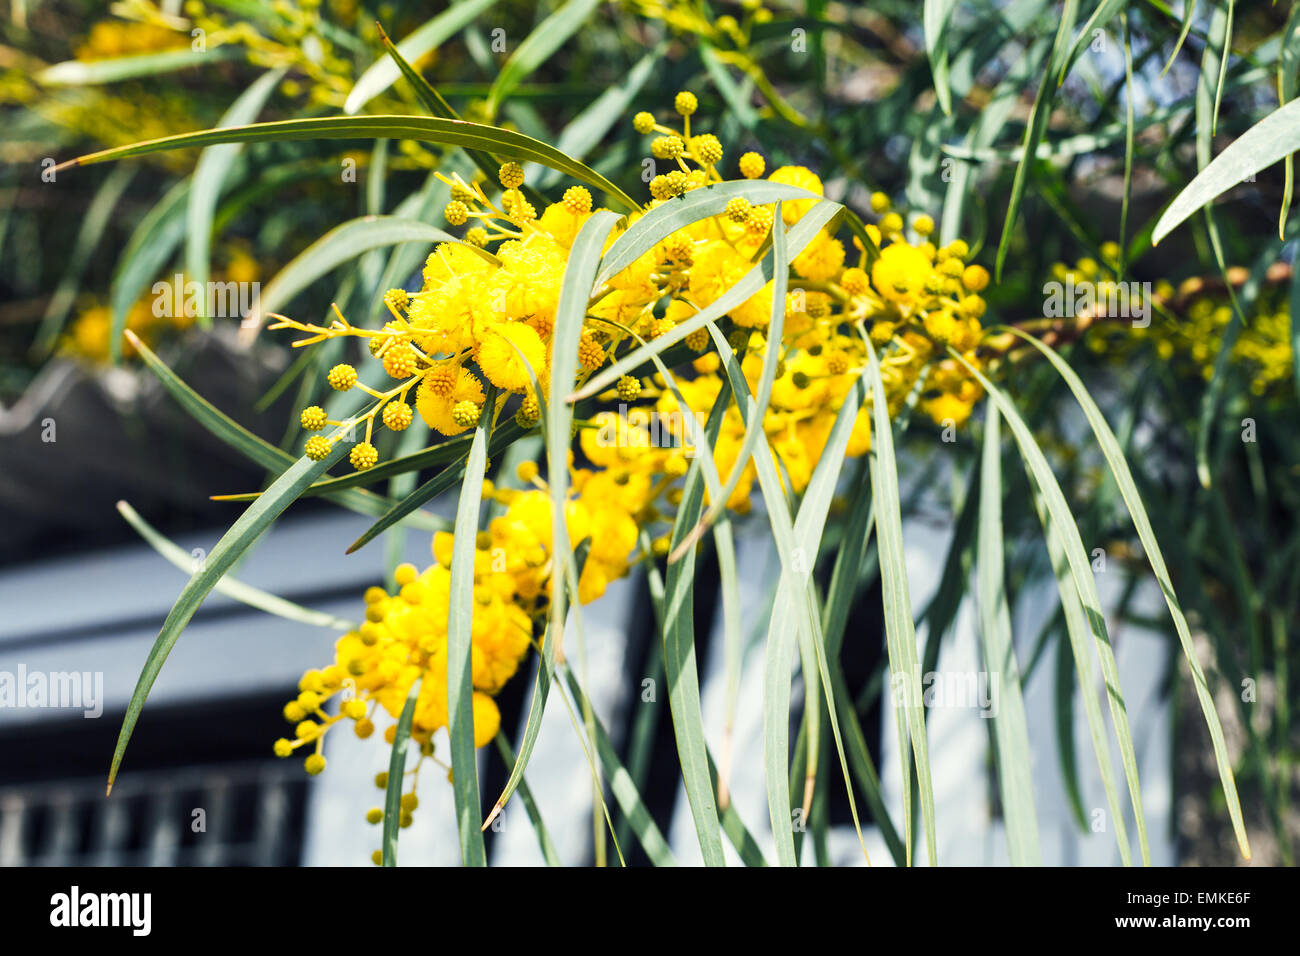 mimosa tree stockfotos mimosa tree bilder seite 3 alamy. Black Bedroom Furniture Sets. Home Design Ideas